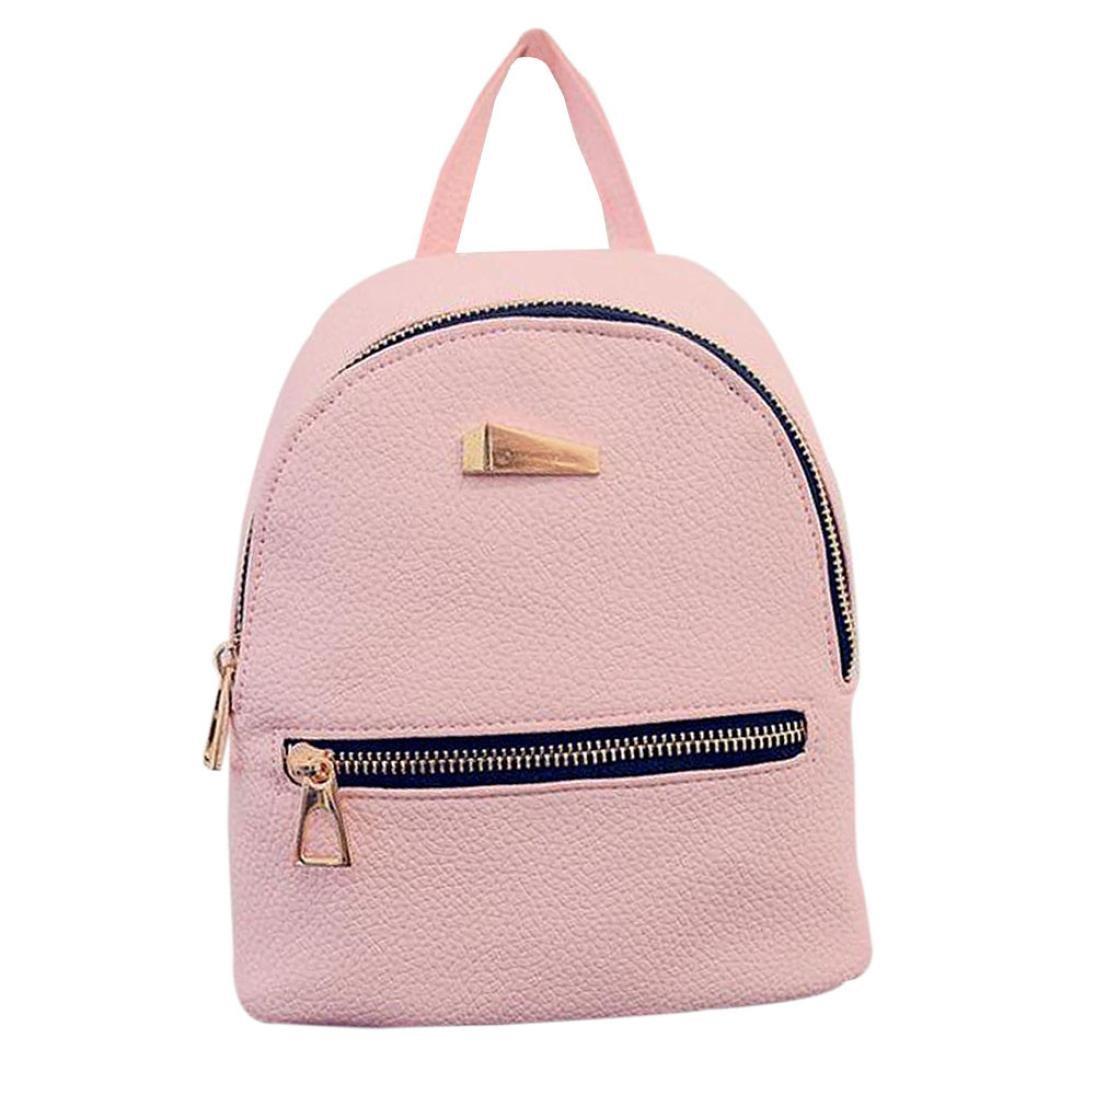 VIASA Women's Fashion Leisure New Backpack Travel Summer Handbag School Rucksack (Pink)